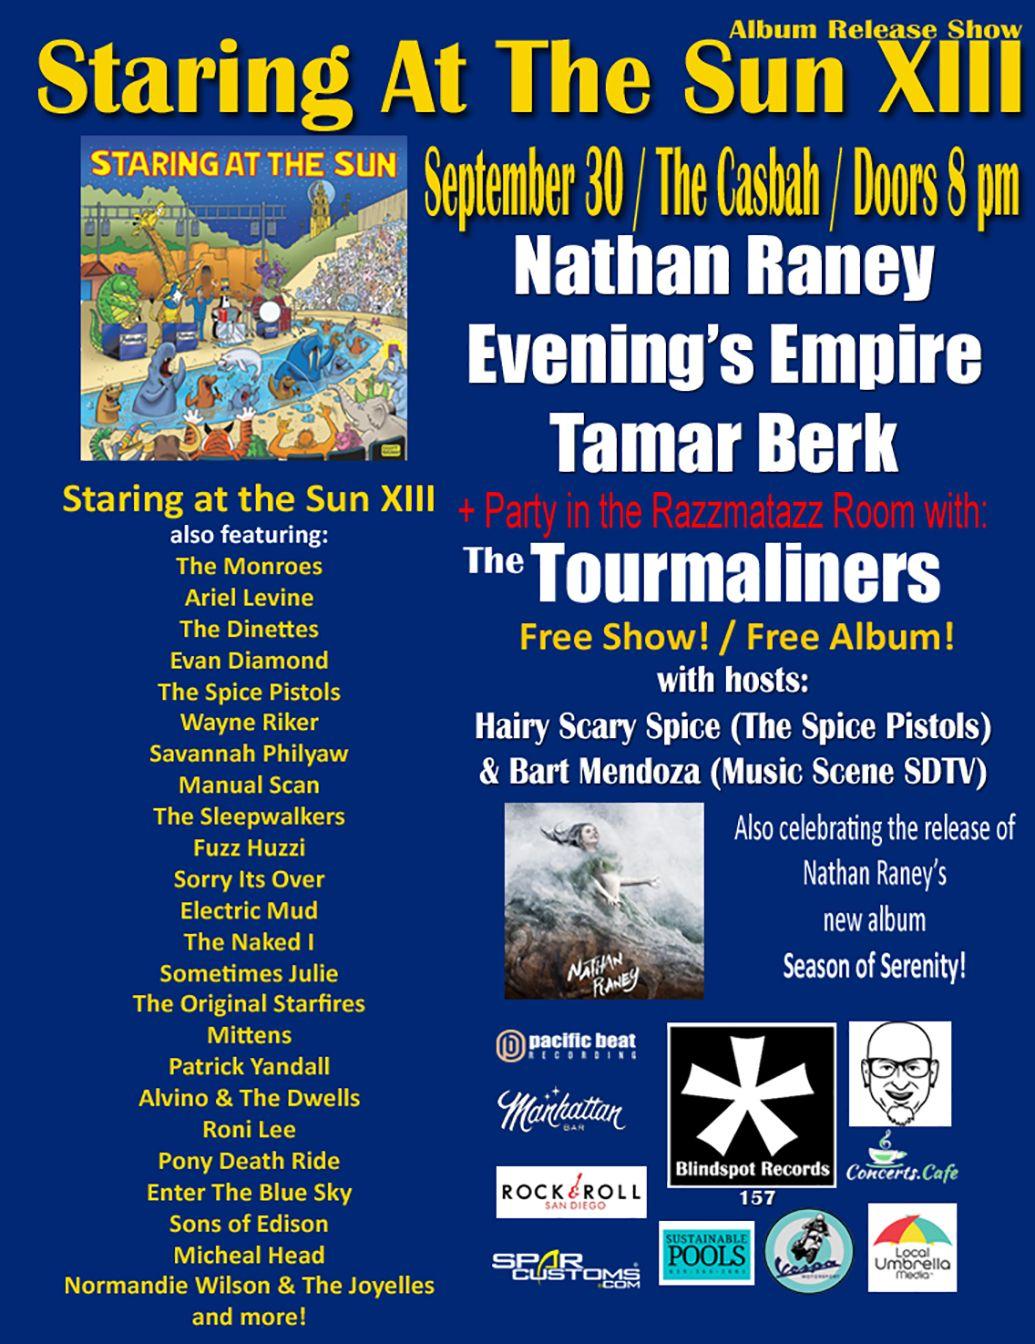 Nathan Raney, Evening's Empire, Tamar Berk: